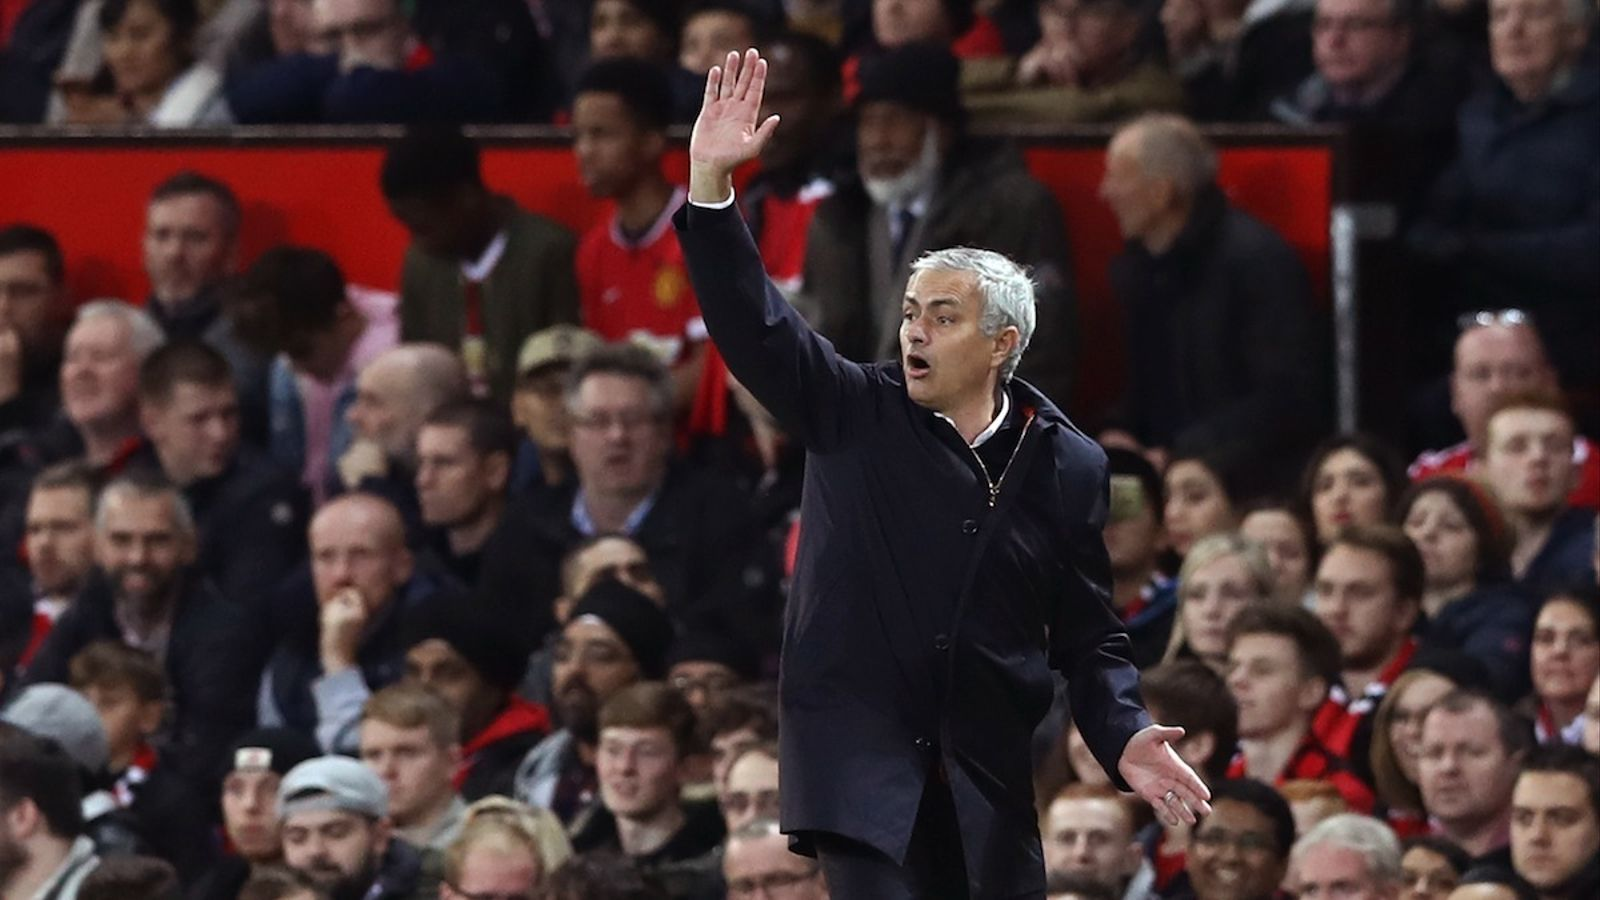 José Mourinho, durant el partit contra el City